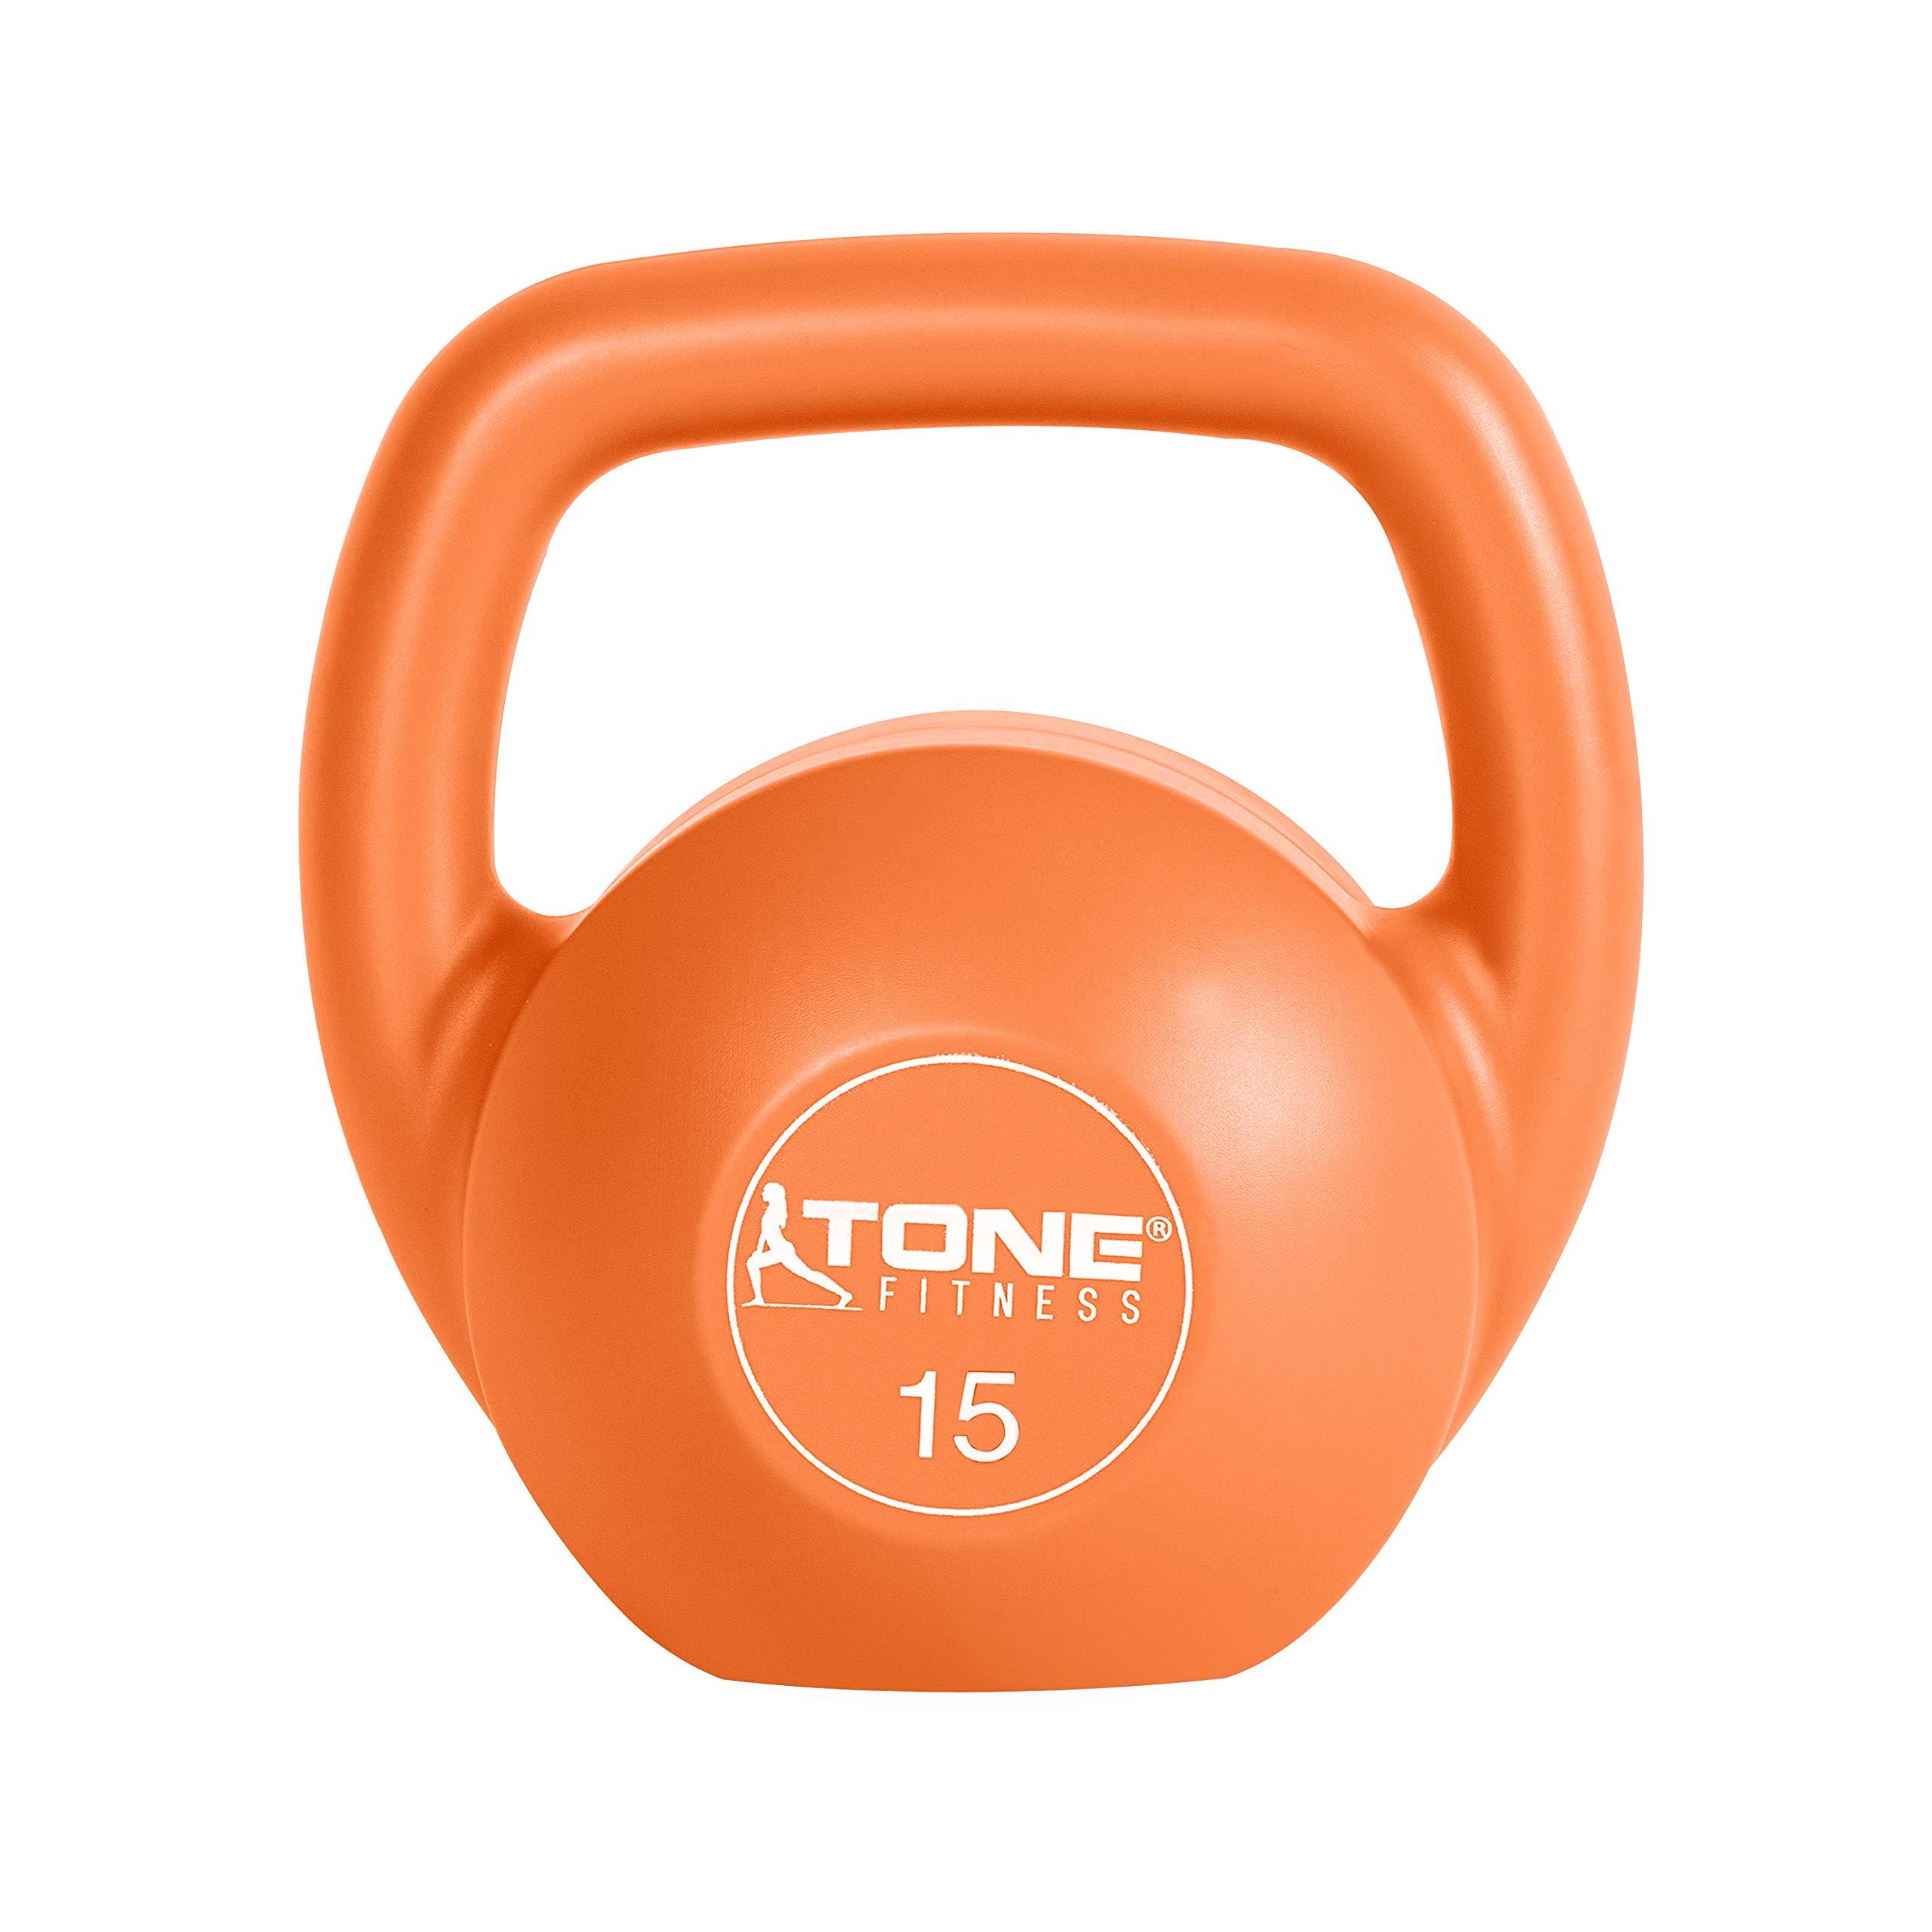 Tone Fitness Vinyl Kettlebell, 15-Pound, Orange by Tone Fitness